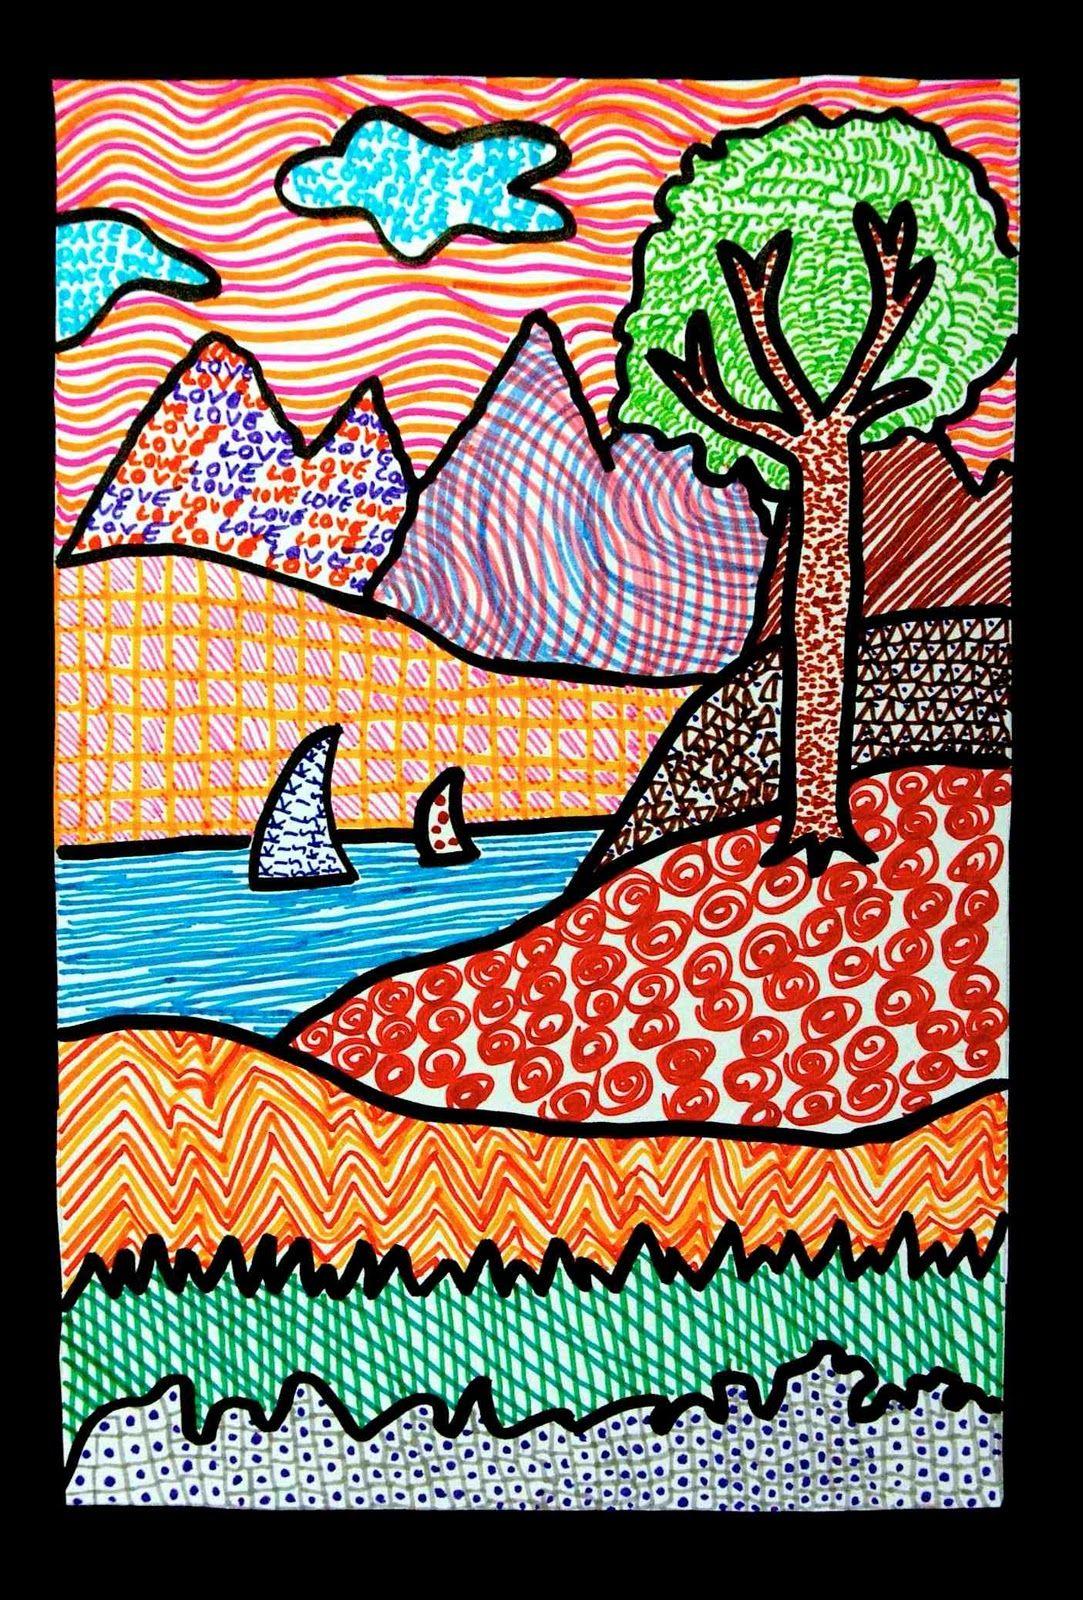 Arteascuola Landscapes Of Texture